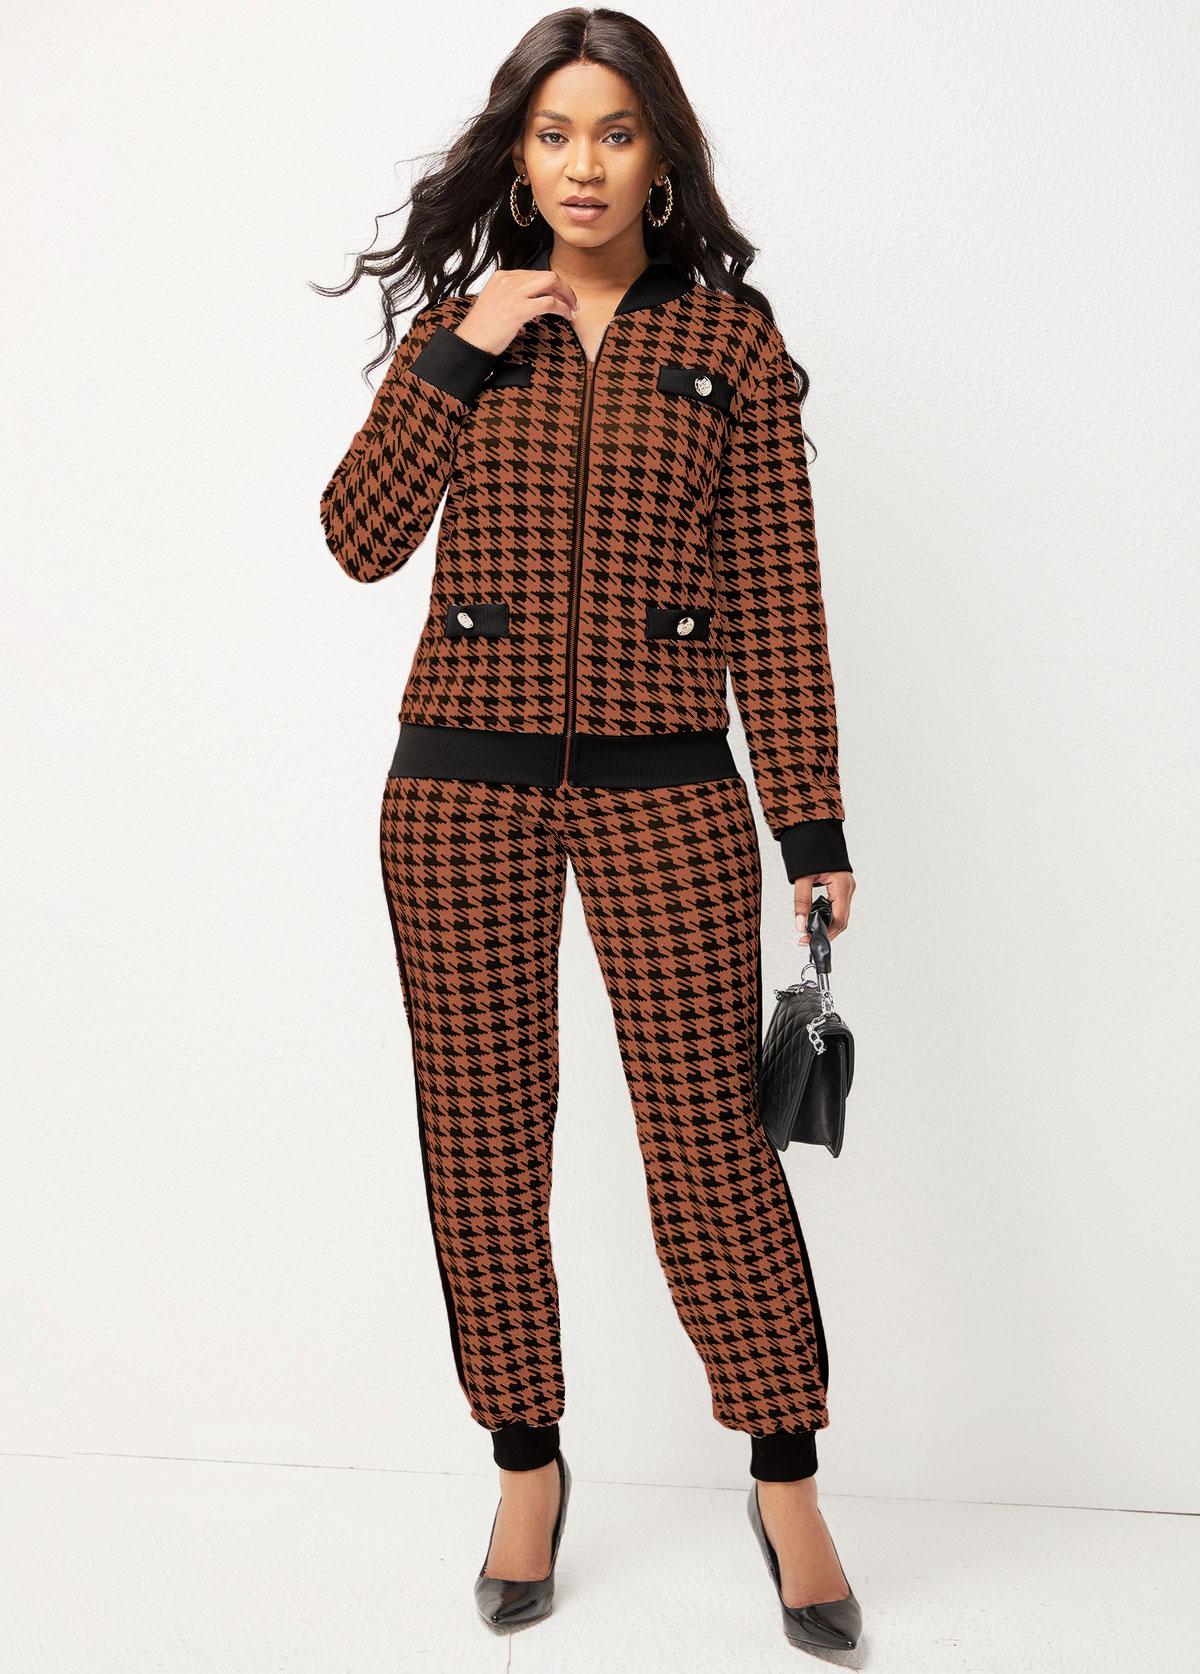 Long Sleeve Houndstooth Print Zipper Closure Sweatsuit